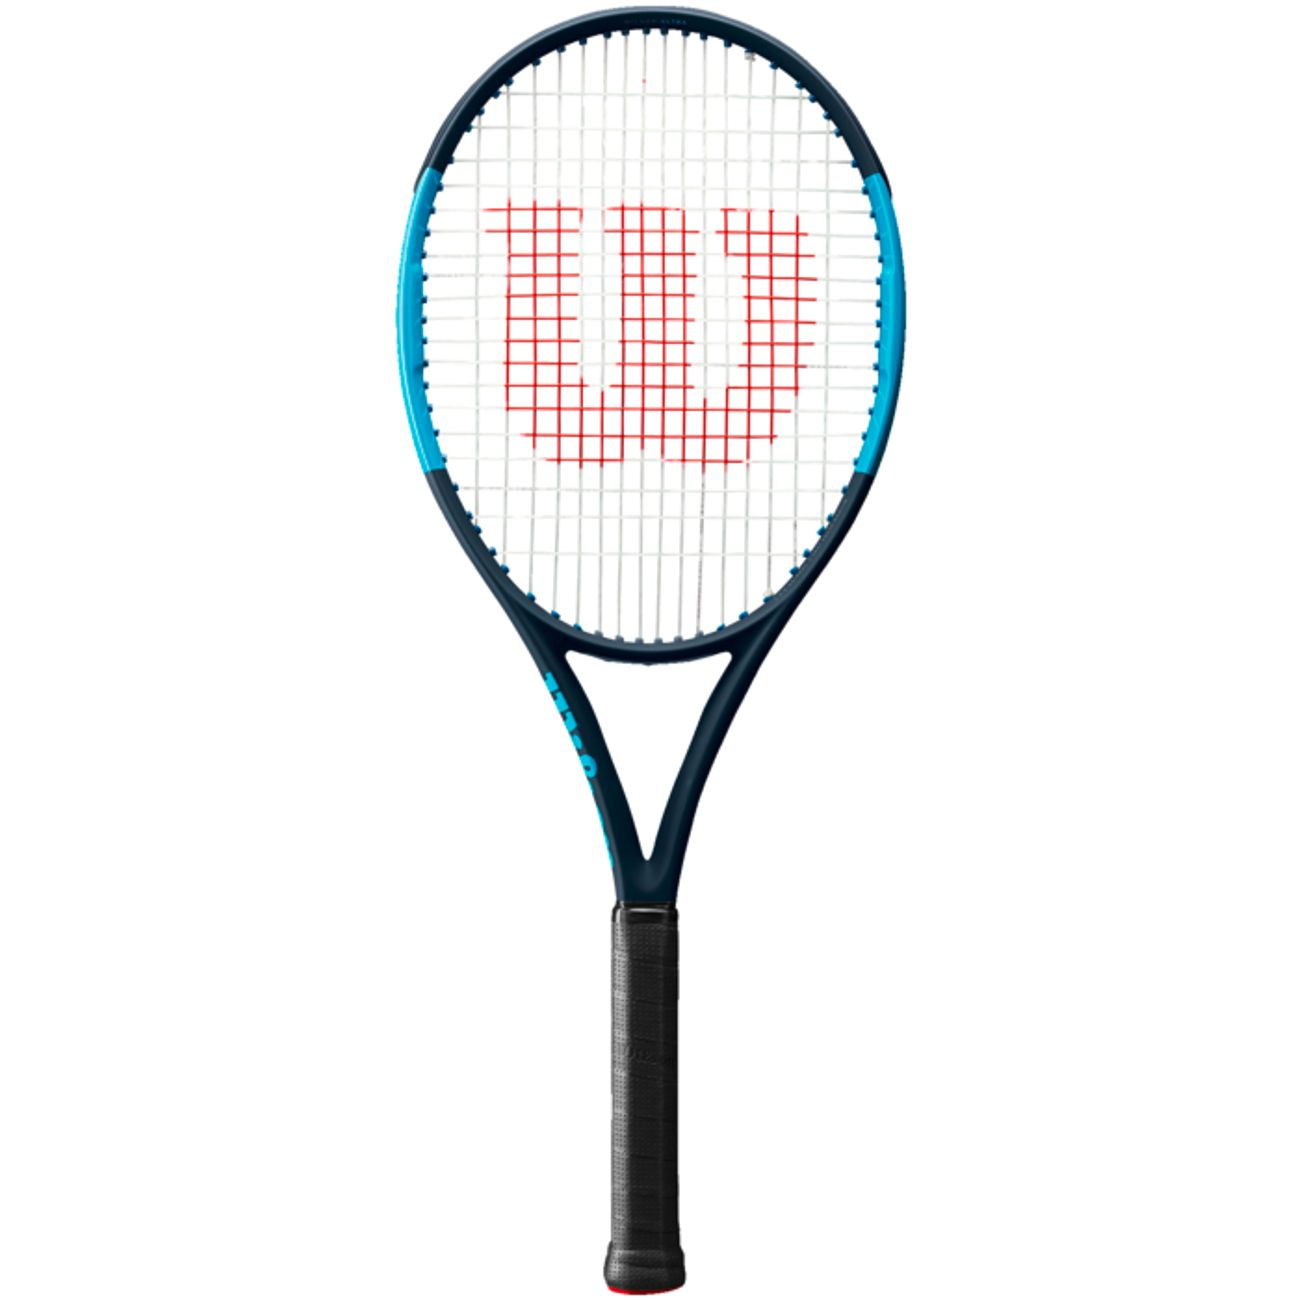 RAQUETTE Tennis adulte WILSON ULTRA 100L